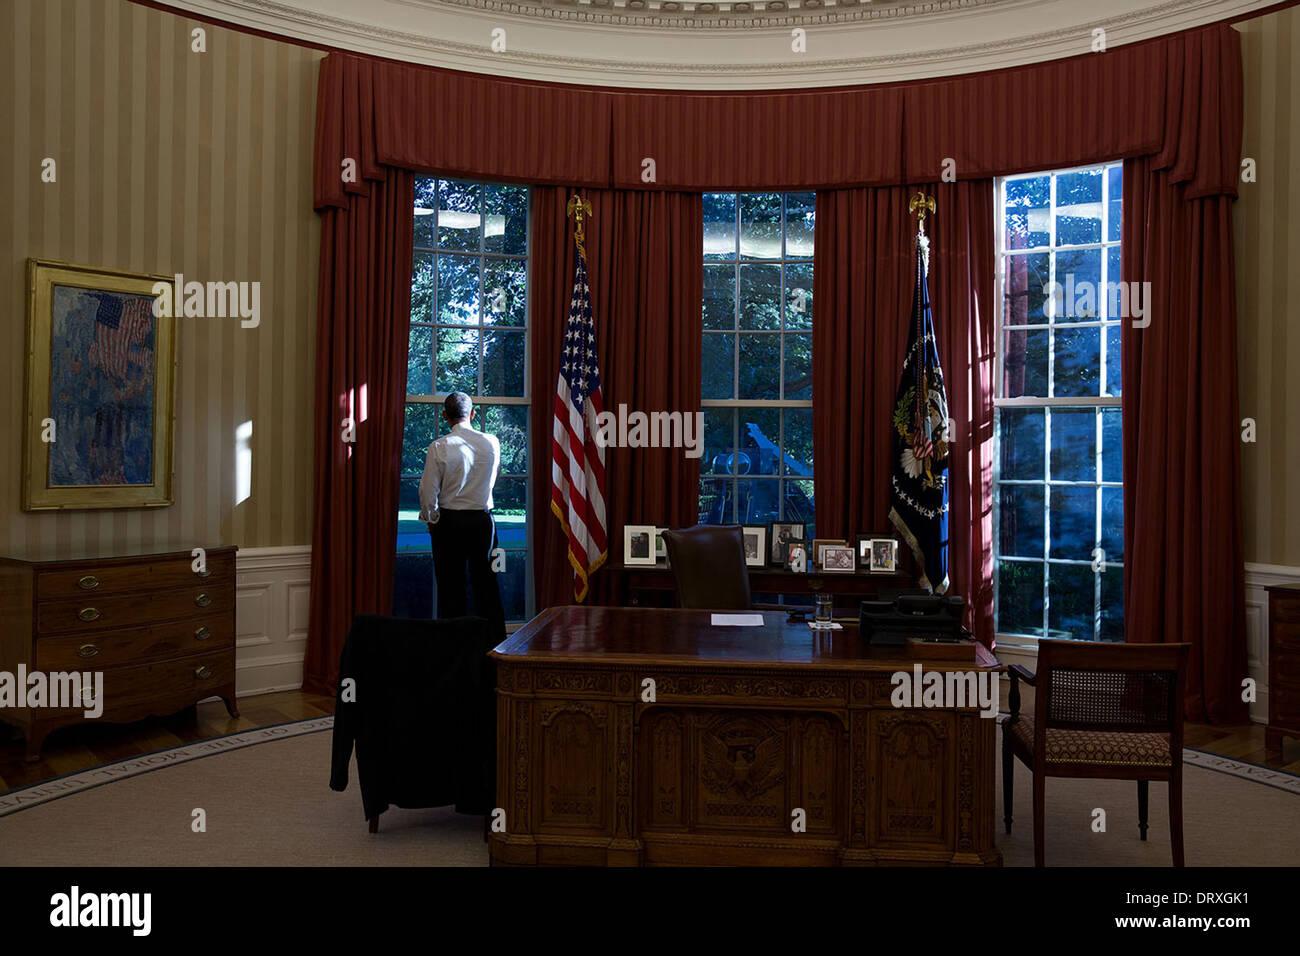 US-Präsident Barack Obama aus dem Fenster des Oval Office des weißen Hauses 17. September 2013 in Washington, DC sieht. Stockbild